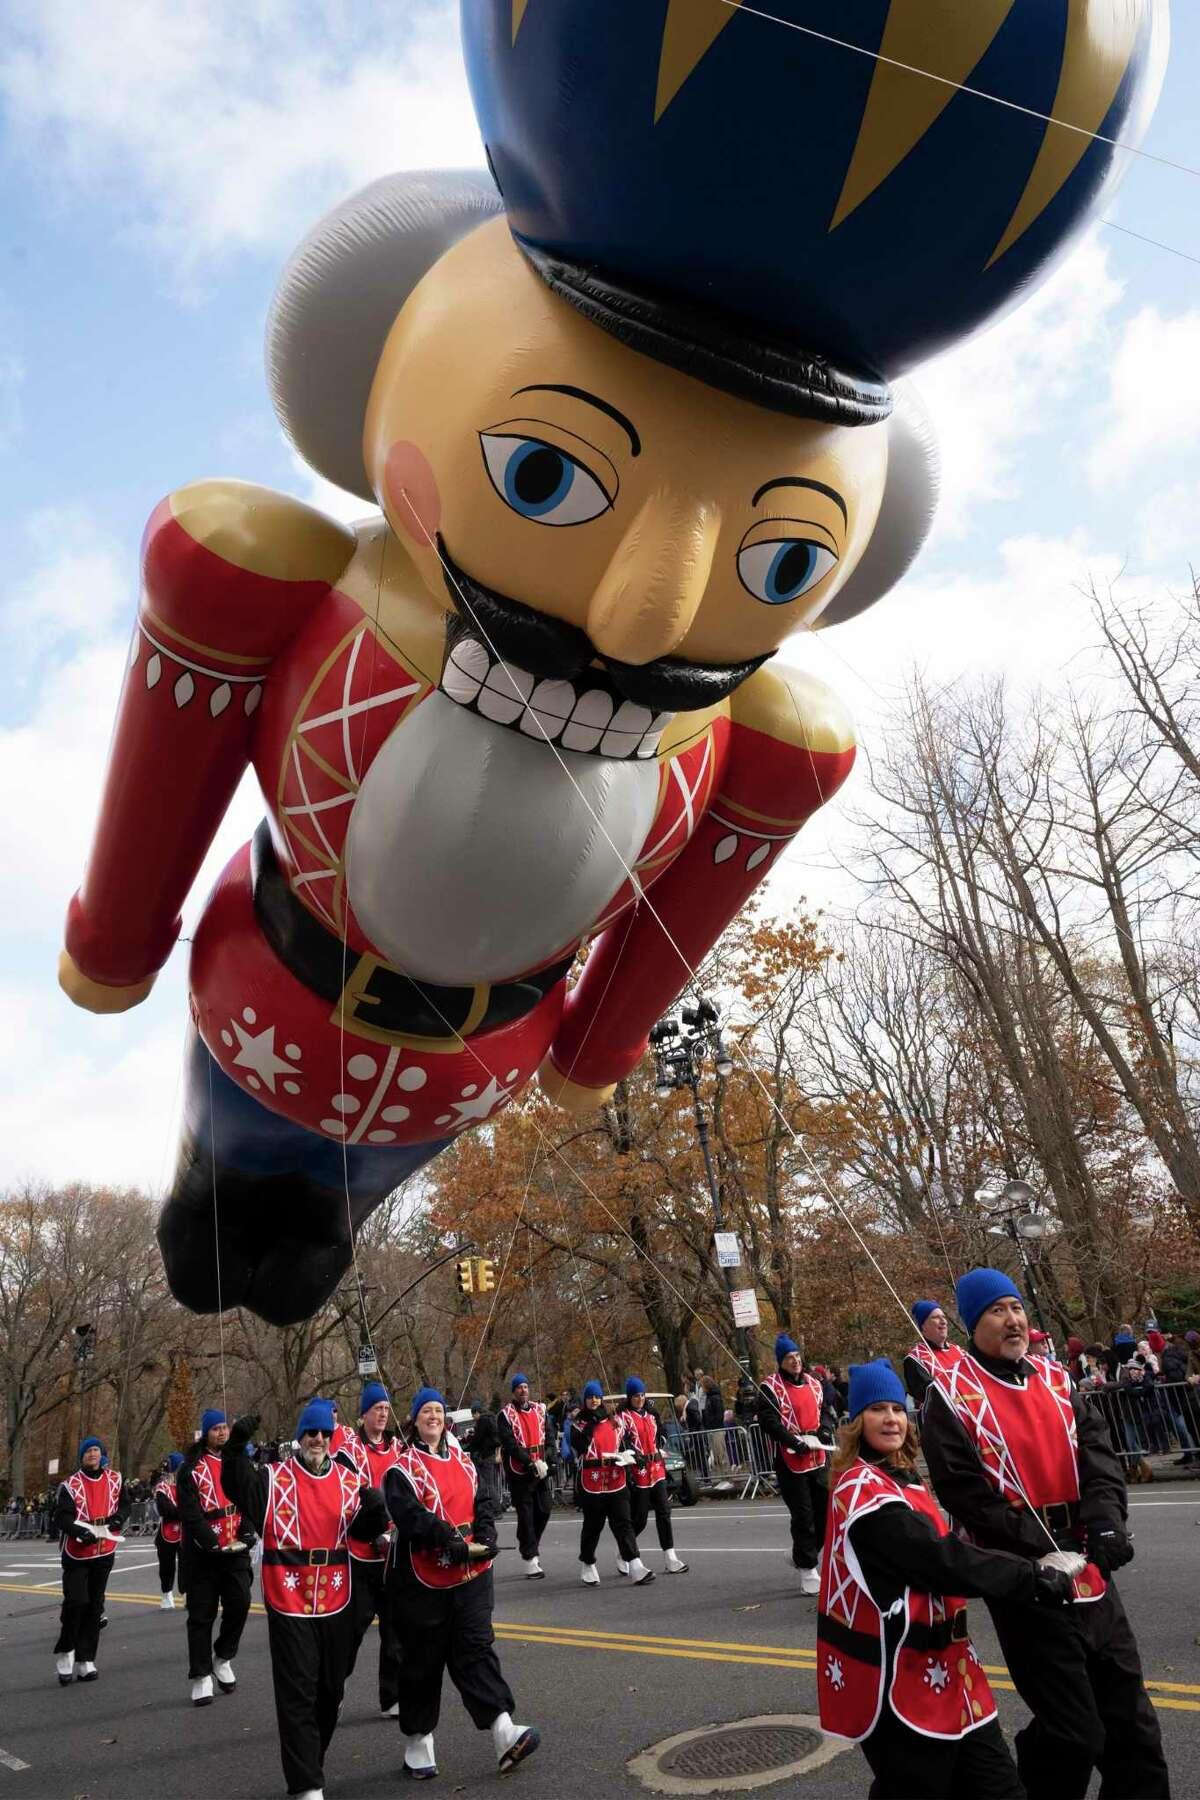 The Nutcracker balloon is in the Macy's Thanksgiving Day Parade, Thursday, Nov. 28, 2019, in New York. (AP Photo/Mark Lennihan)